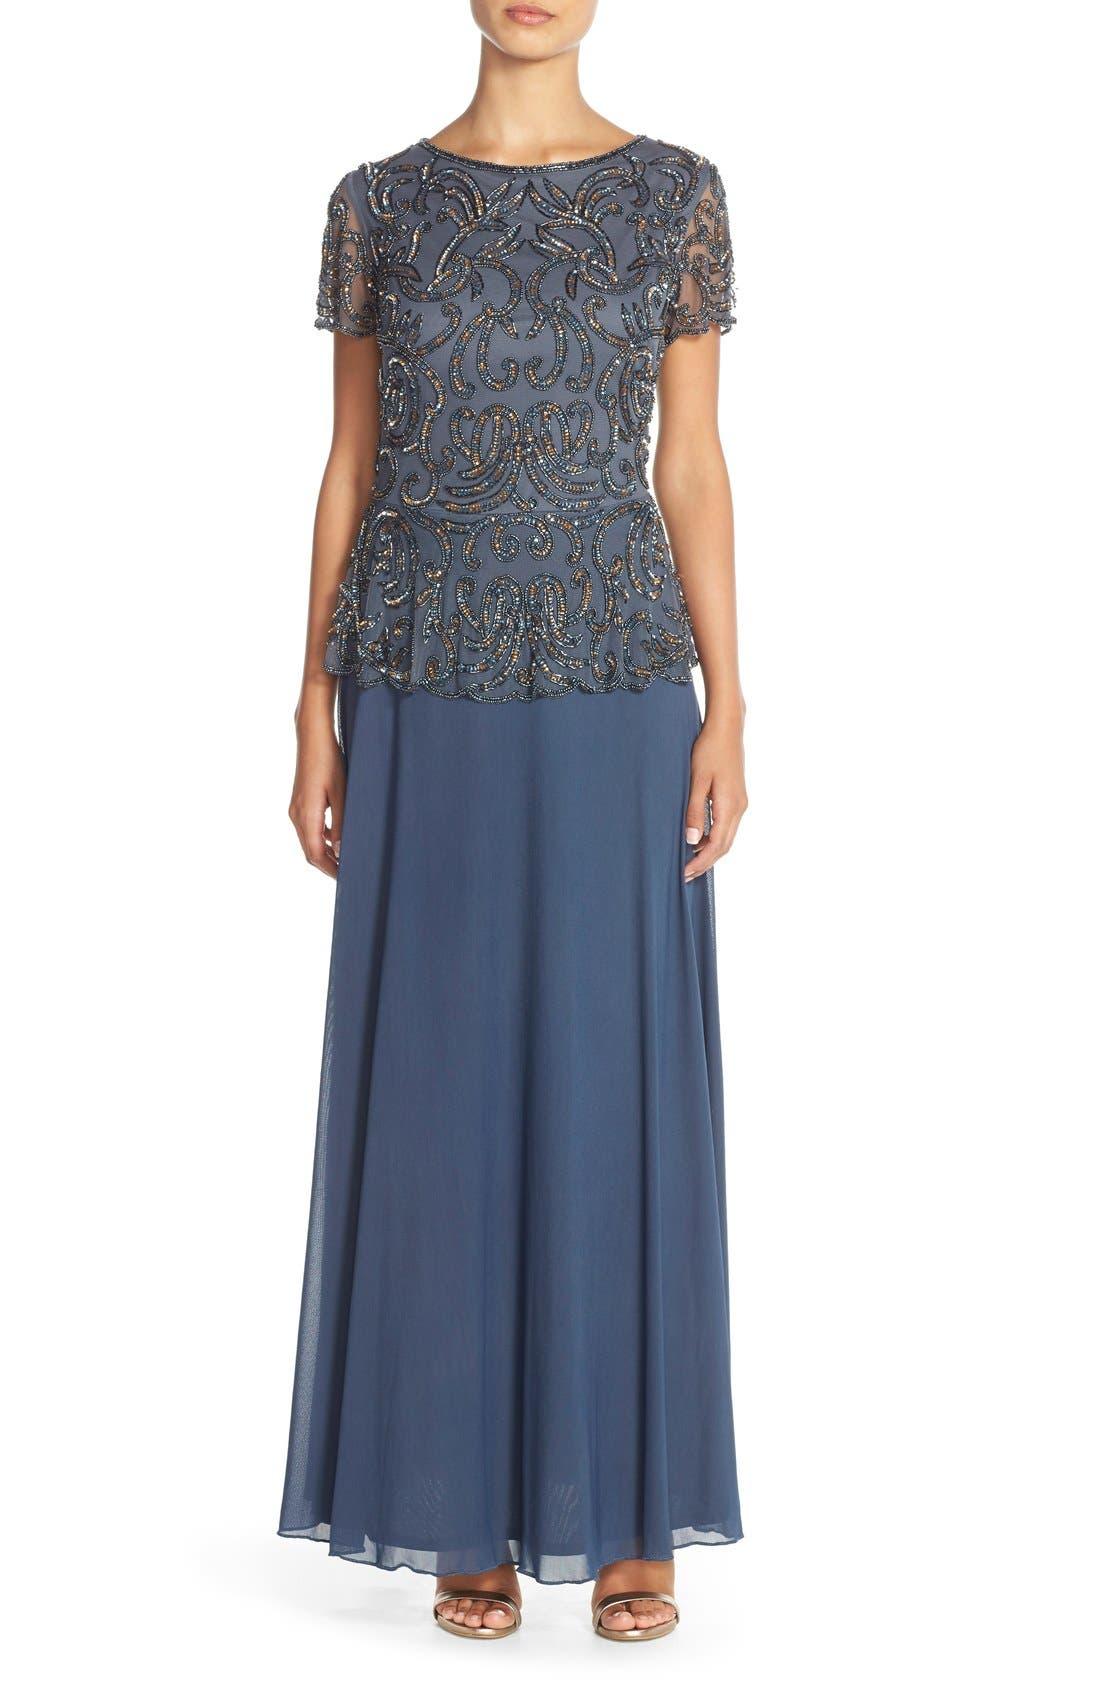 Main Image - Pisarro Nights Embellished Mesh & Chiffon Gown